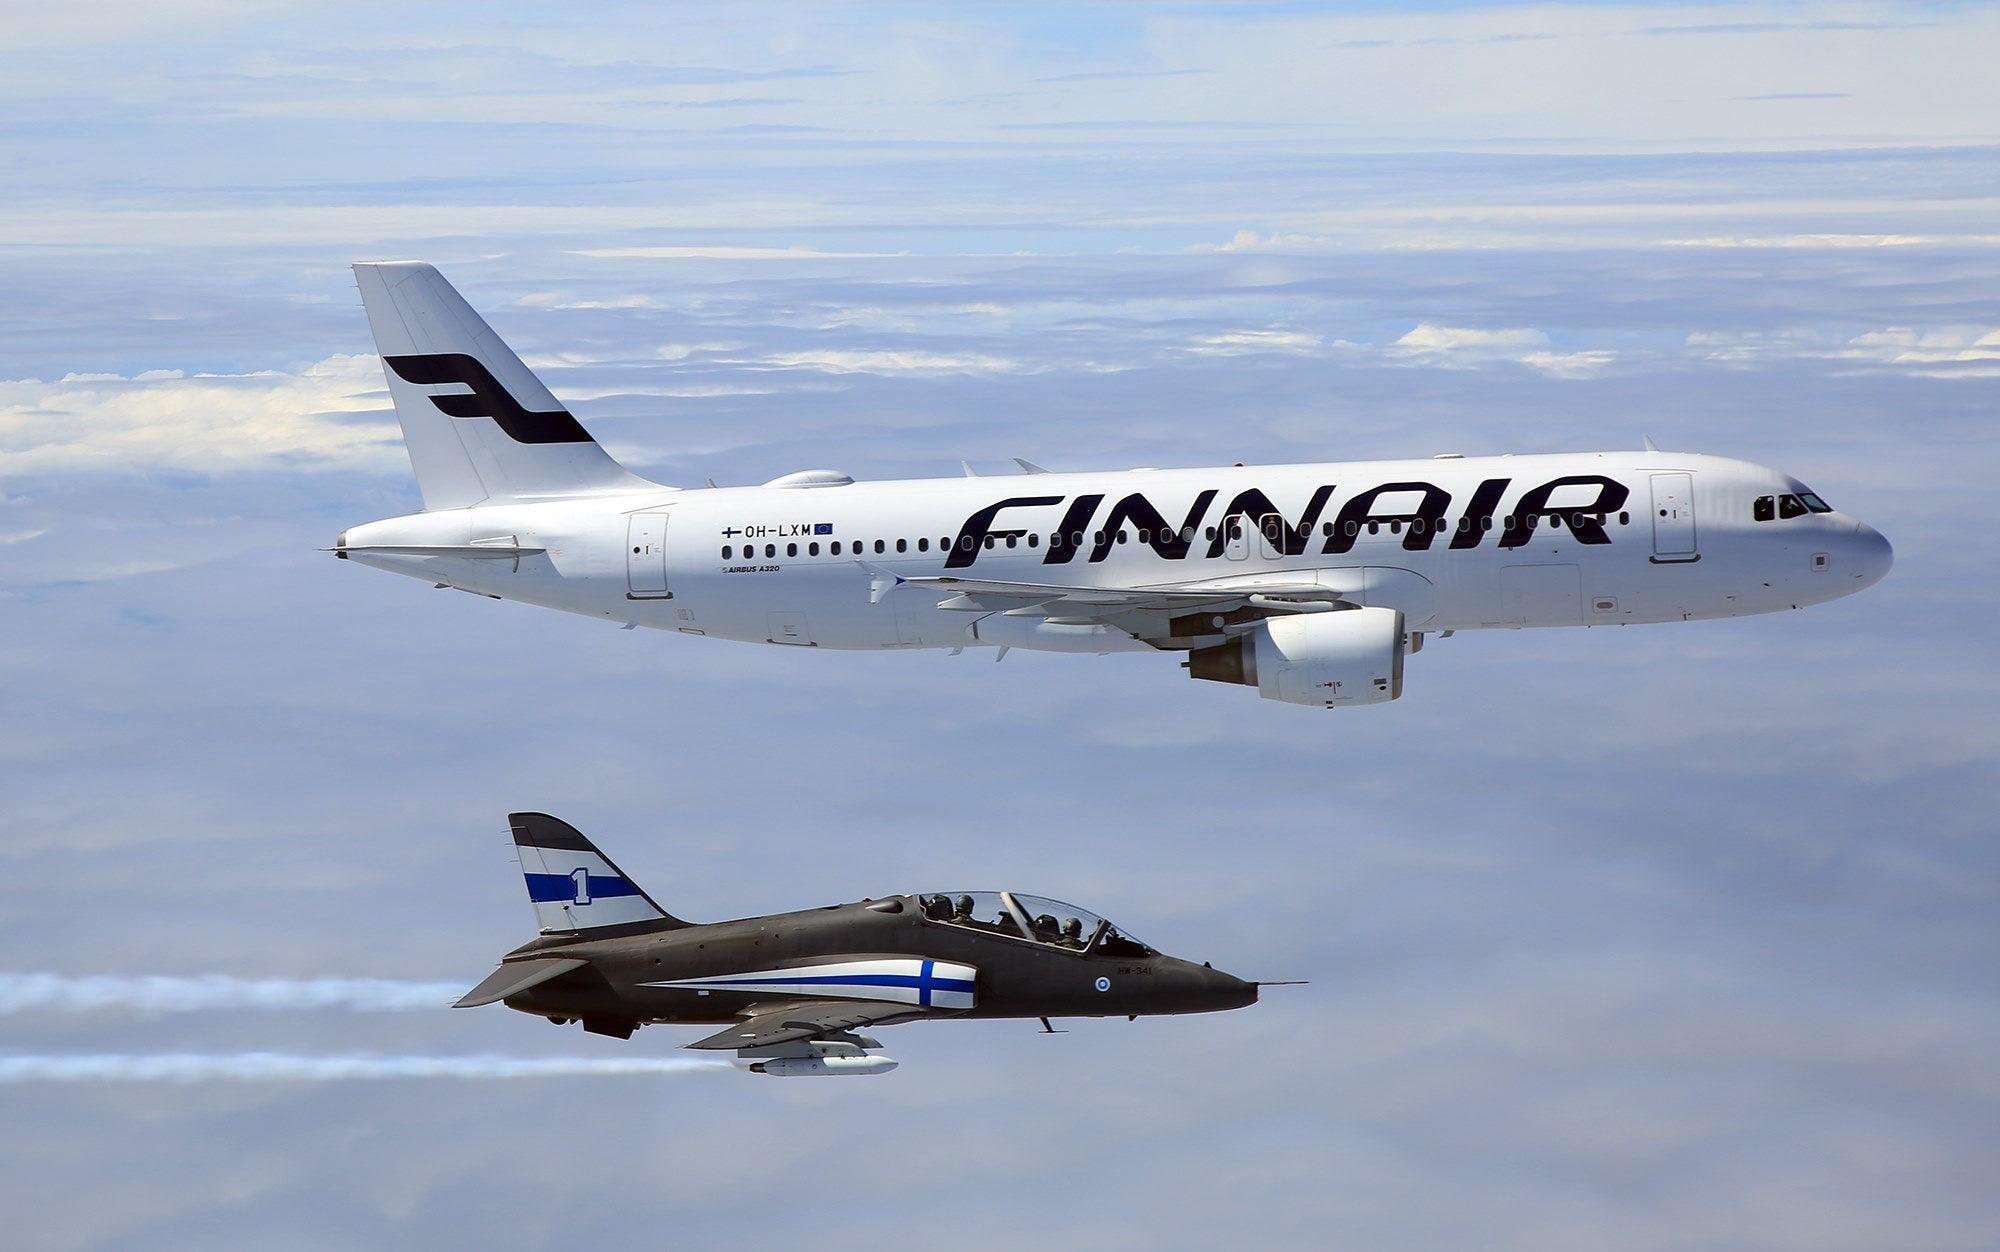 The Finnish Air Force escort the Finnish IIHF 2019 World Champions home